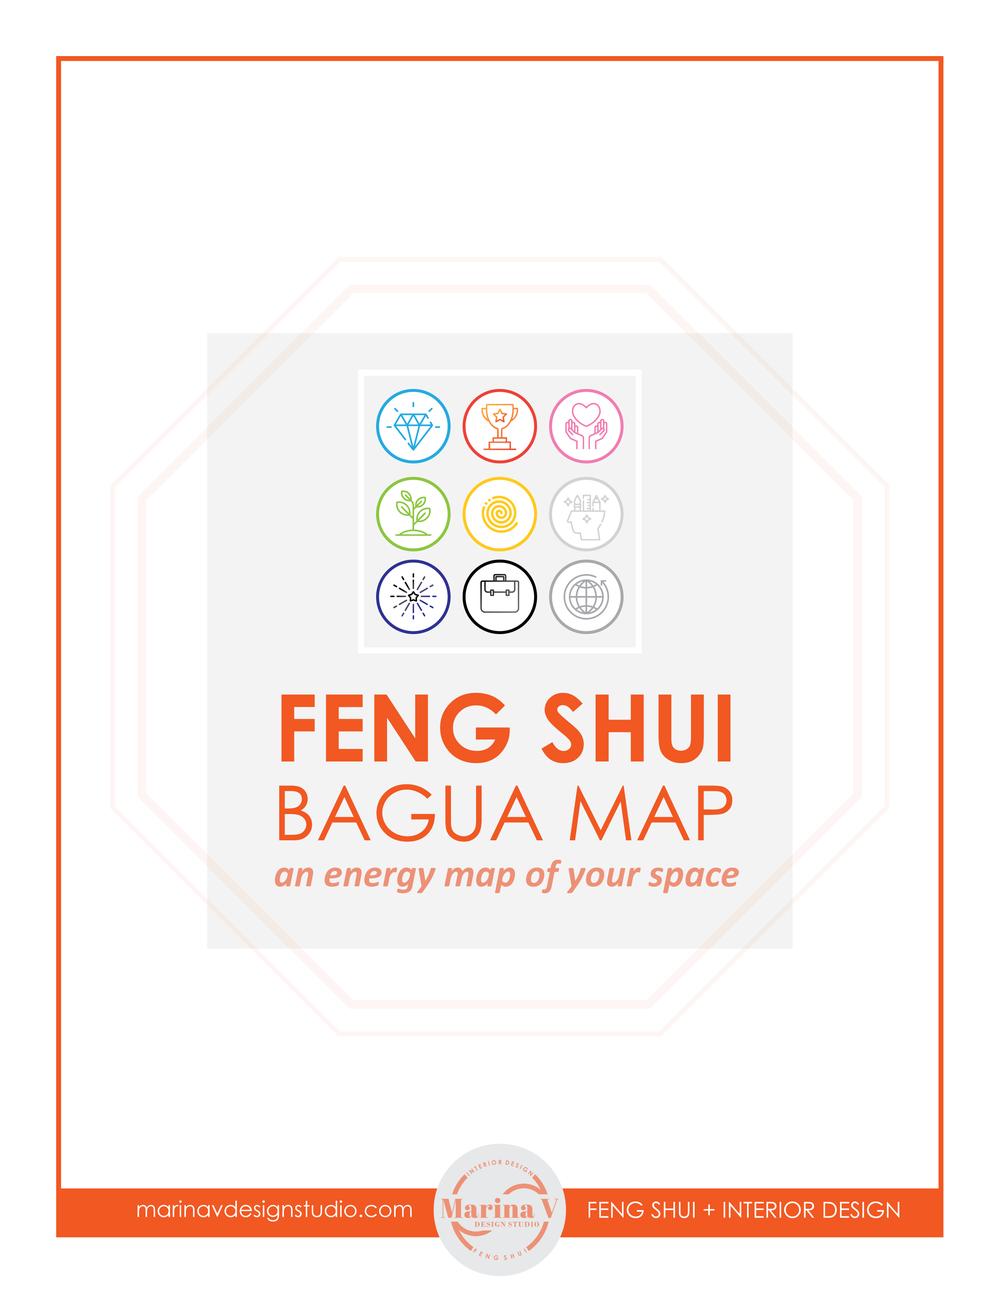 MarinaVDesignStudio Bagua Map